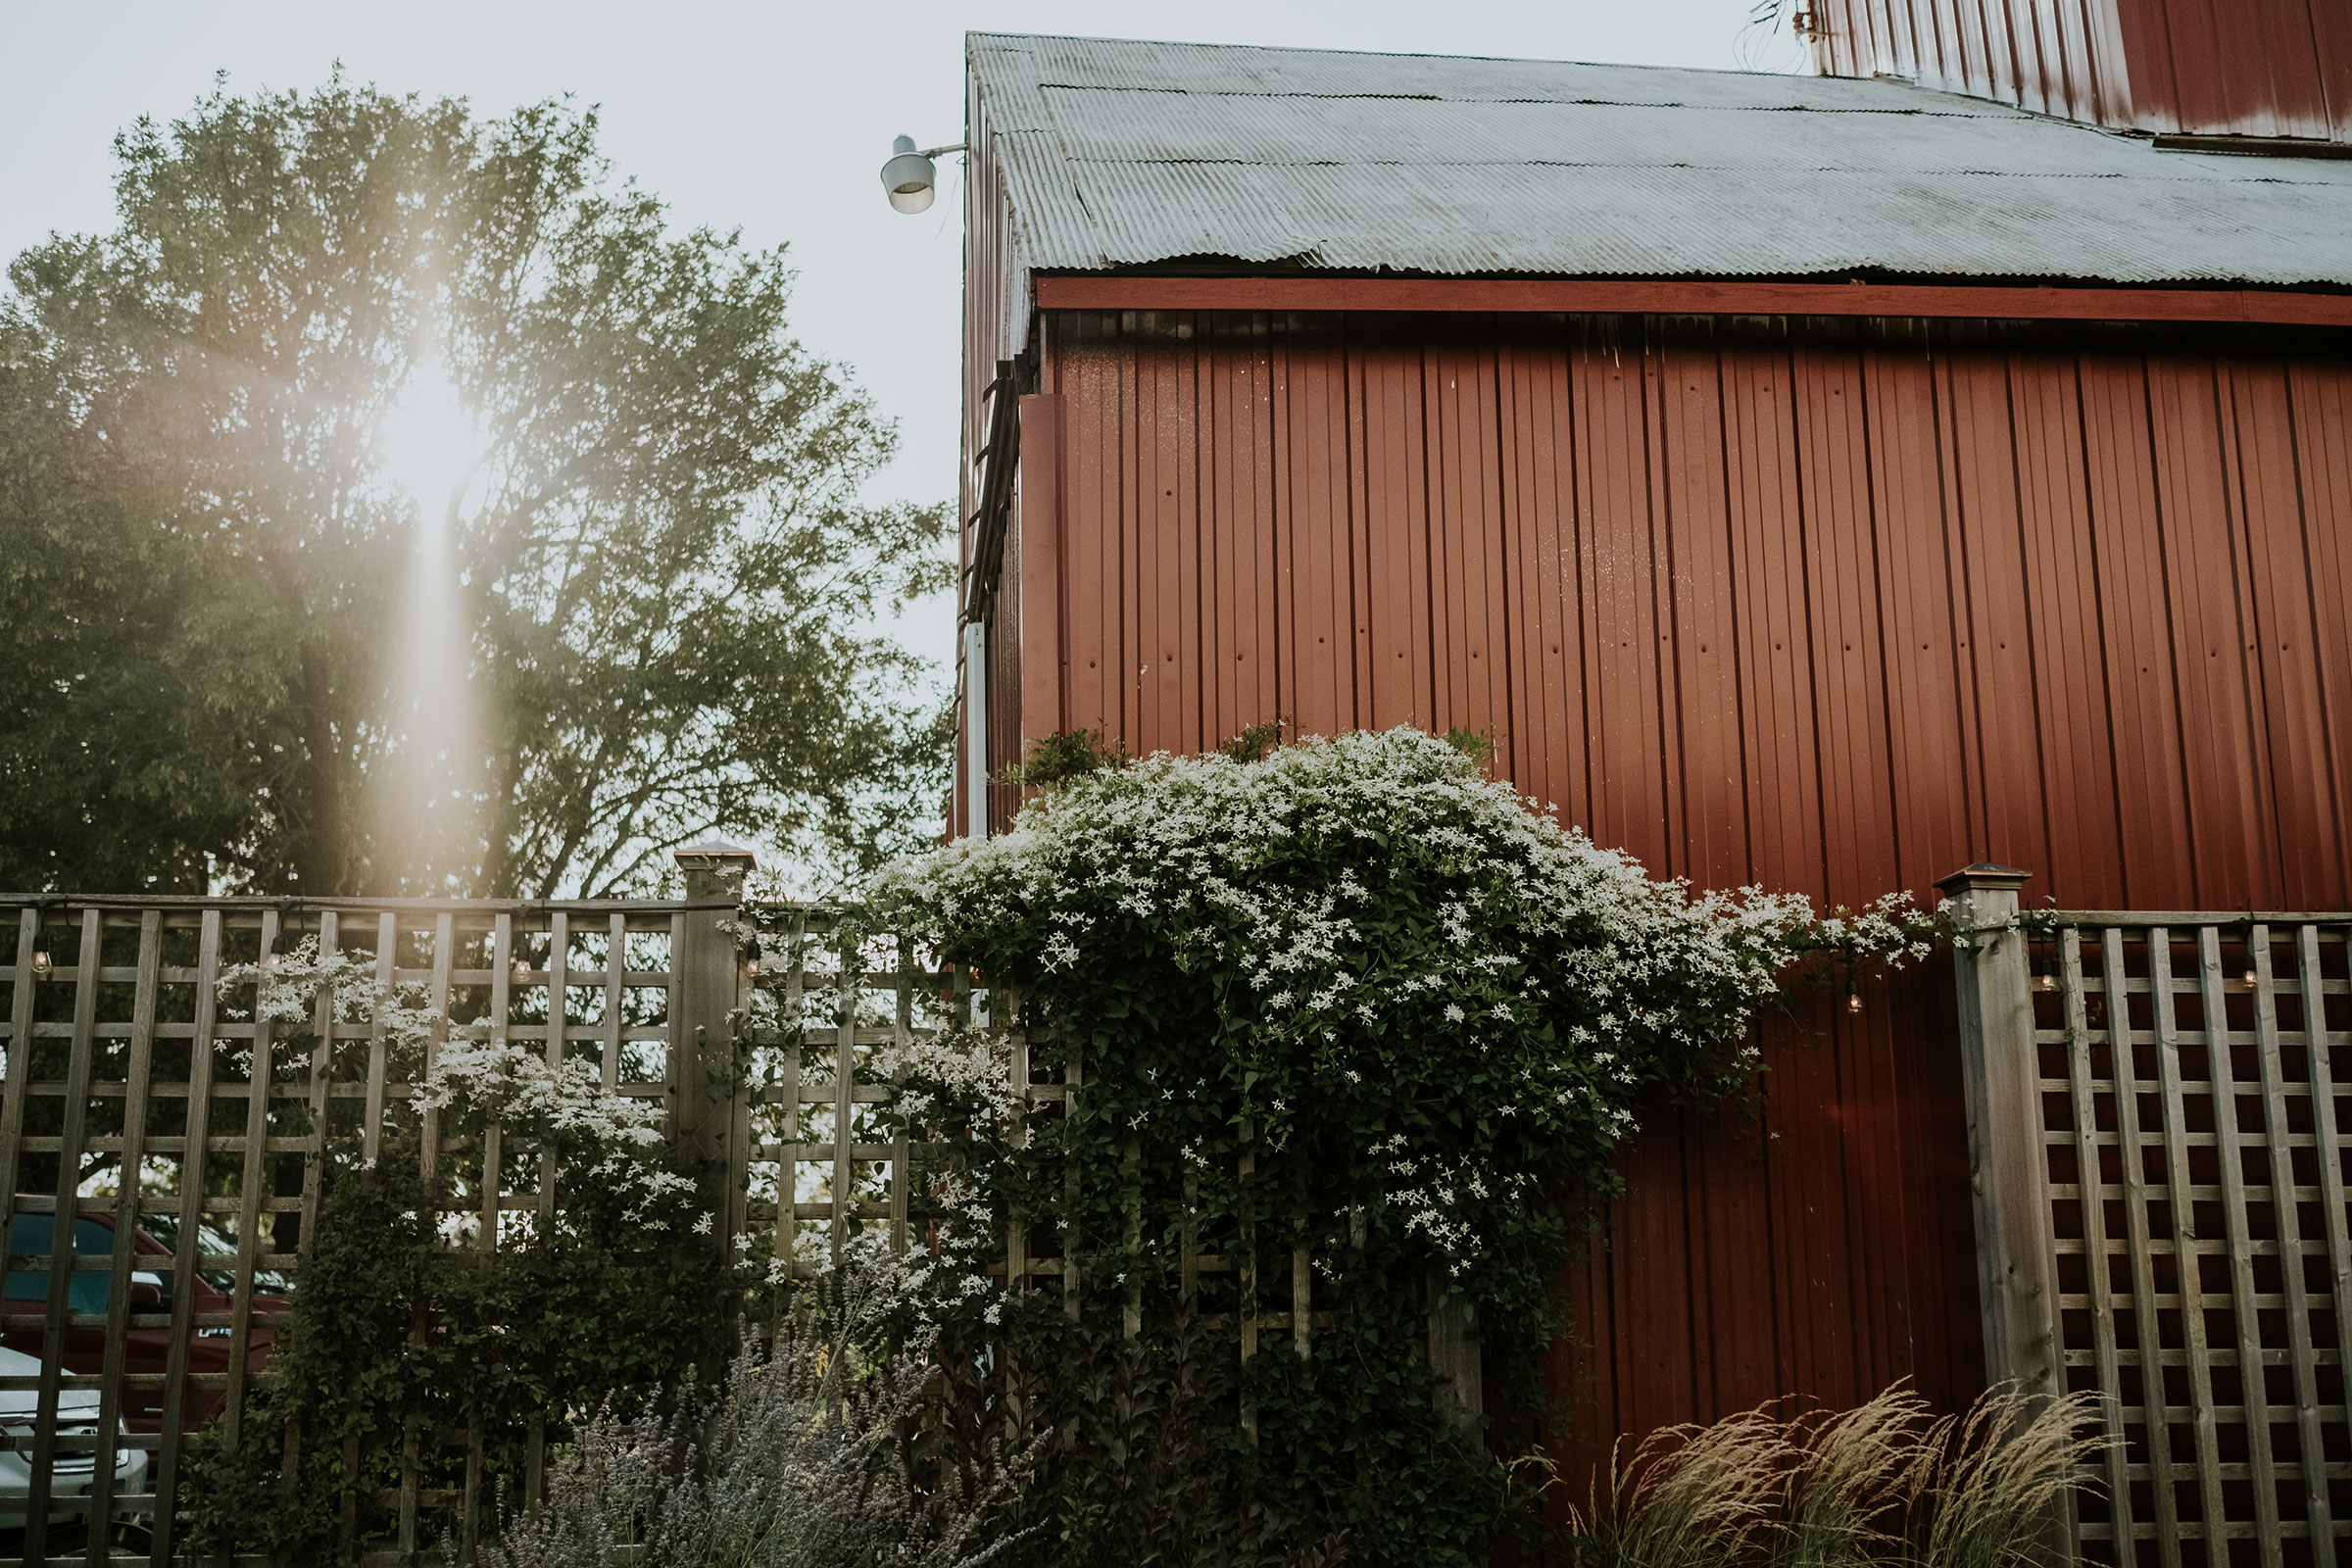 keller-brick-barn-iowa-raelyn-ramey-photography.jpg